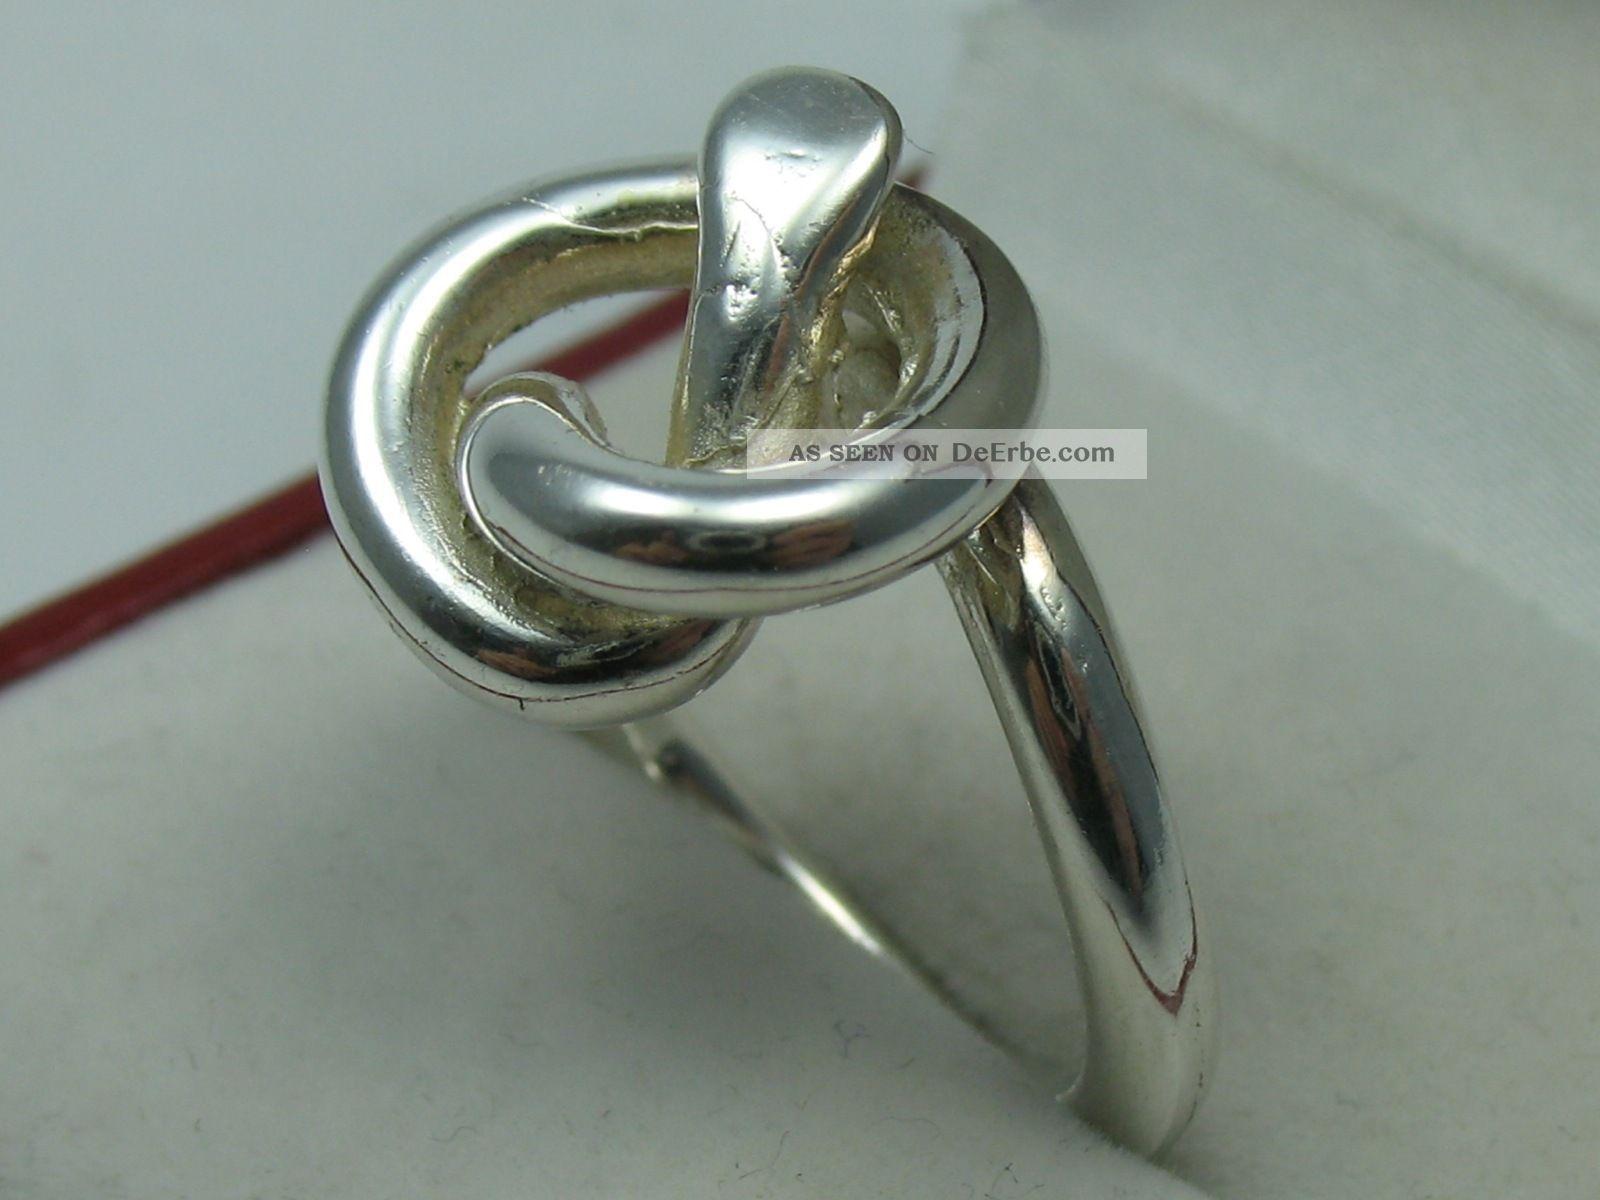 Antikschmuck Schmuck & Accessoires Ringe Antiquitäten